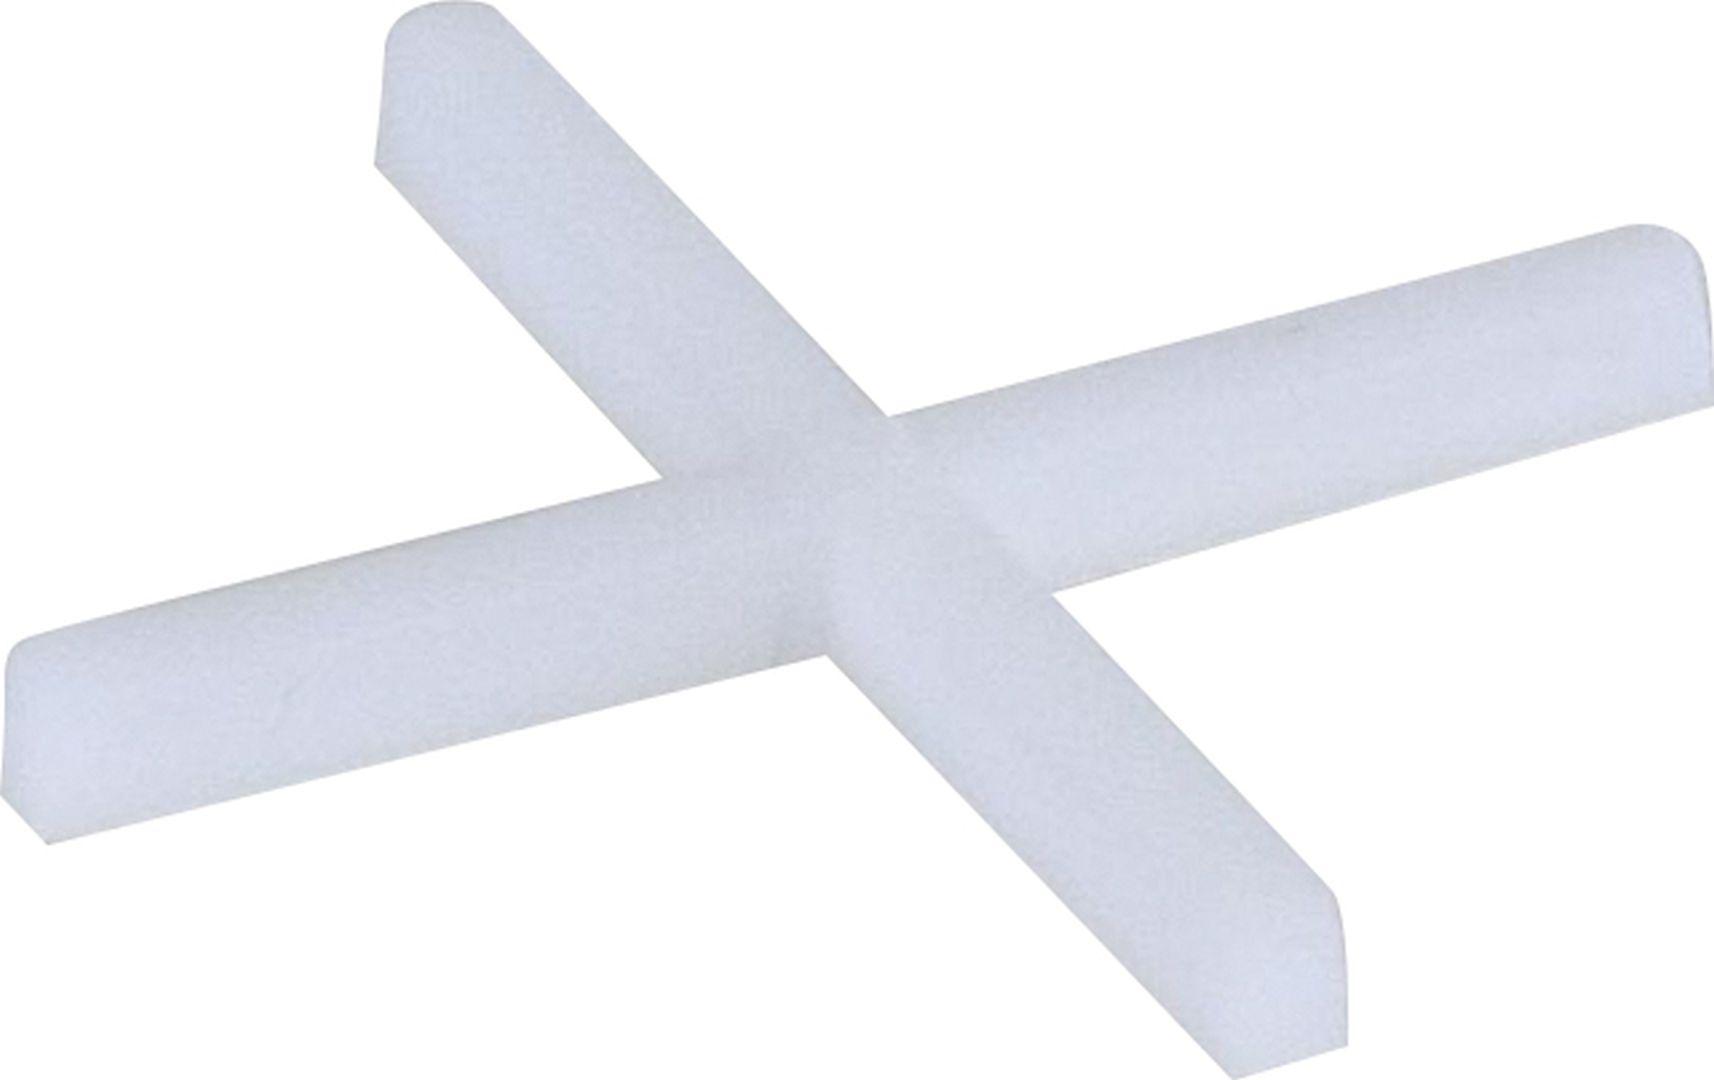 TRIUSO Fliesenkreuze aus Kunststoff, weiß, 250 Stück, 1,0 mm